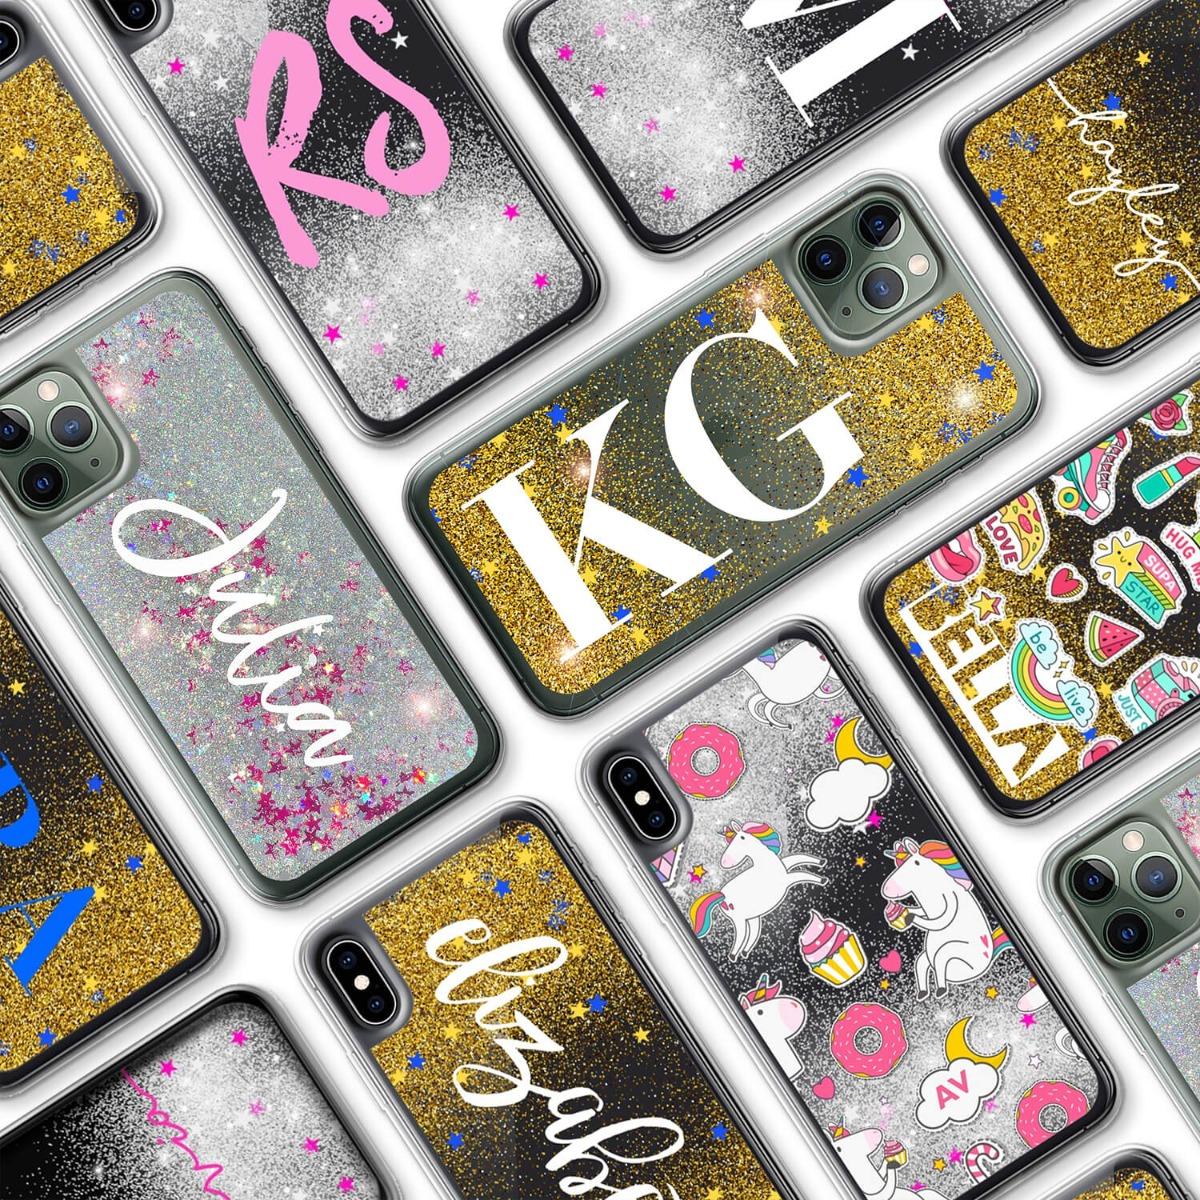 Galaxy S9 Glitter Case 16243